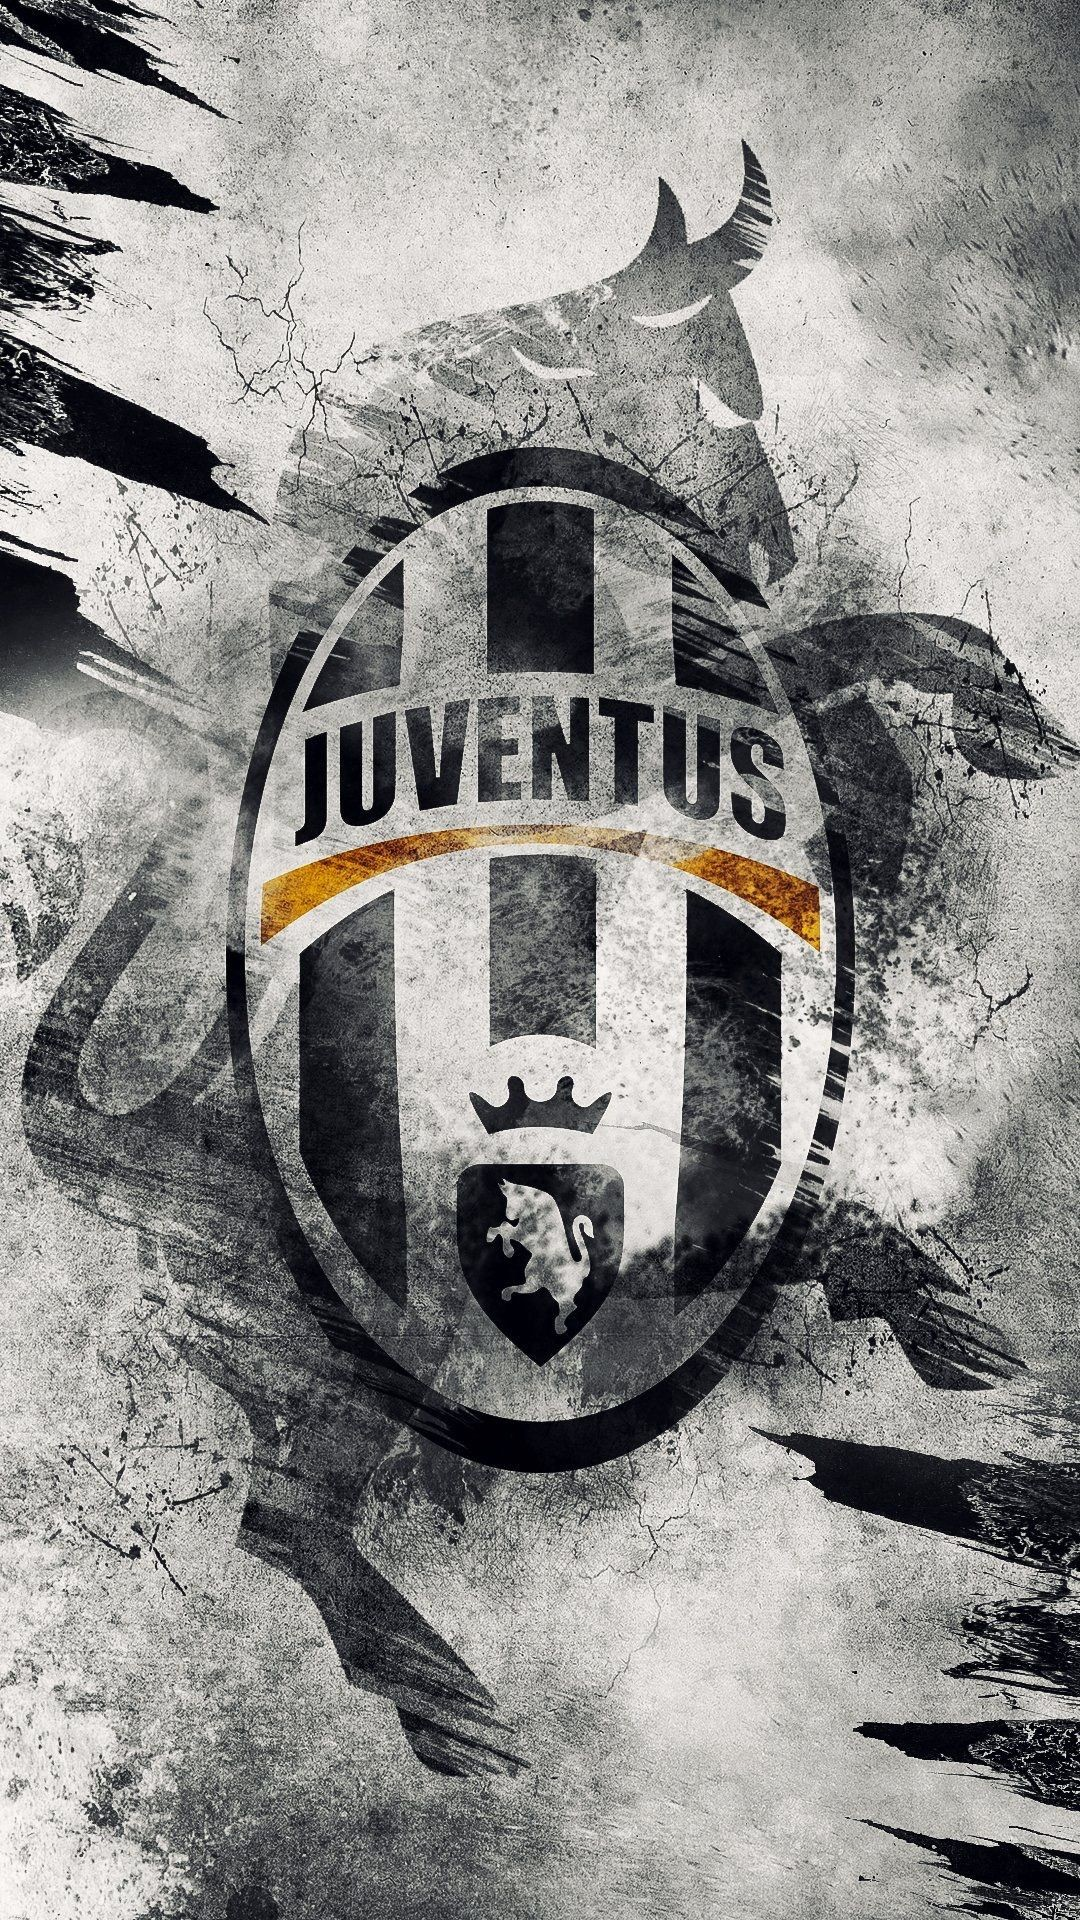 Res: 1080x1920, Sport · Legenden · Juventus FC - Wallpaper